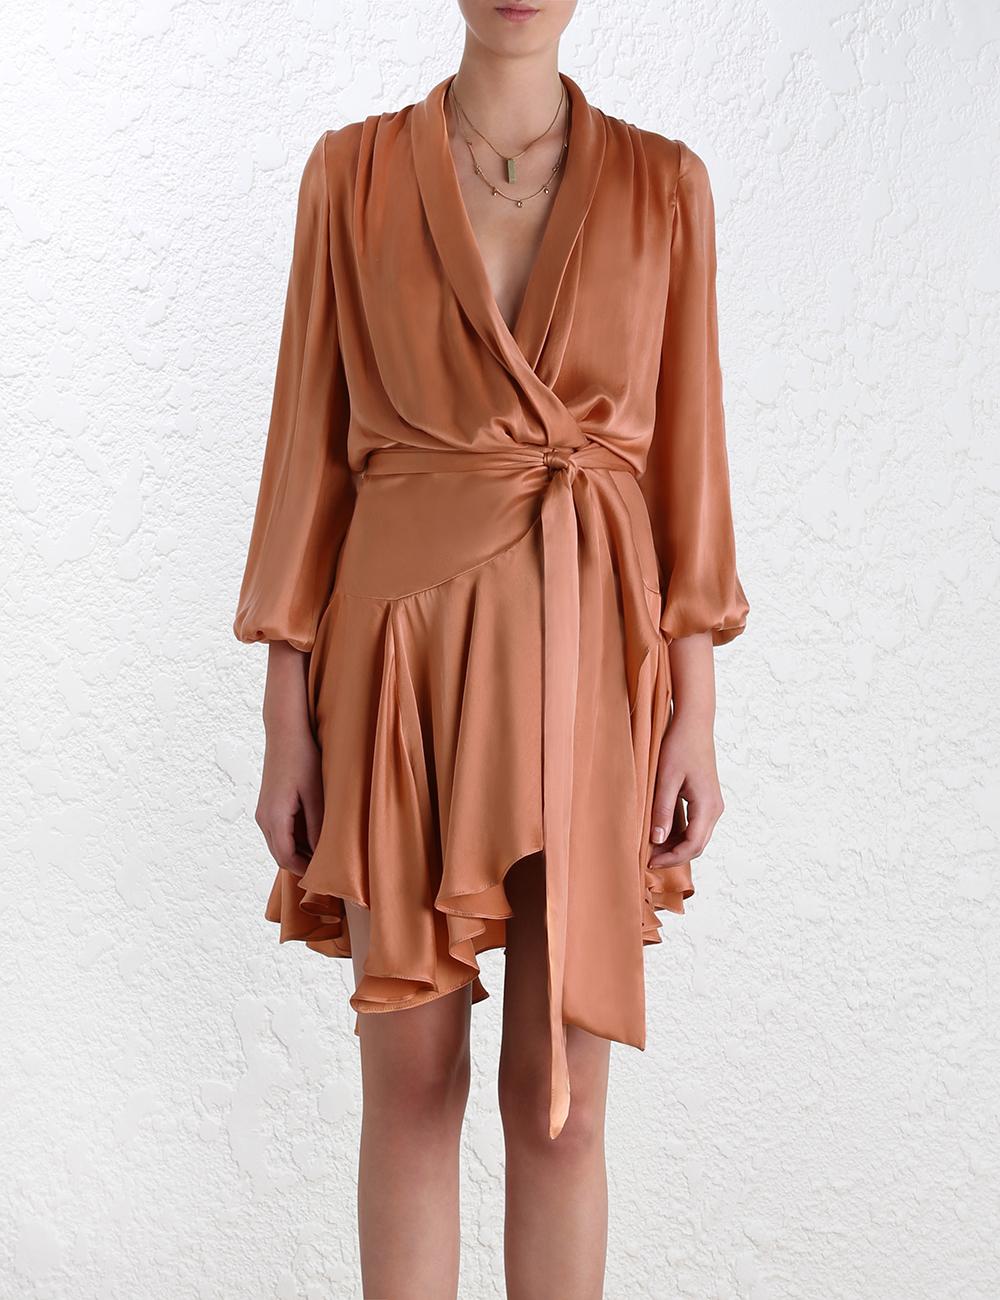 lyst zimmermann empire sueded robe dress in orange. Black Bedroom Furniture Sets. Home Design Ideas